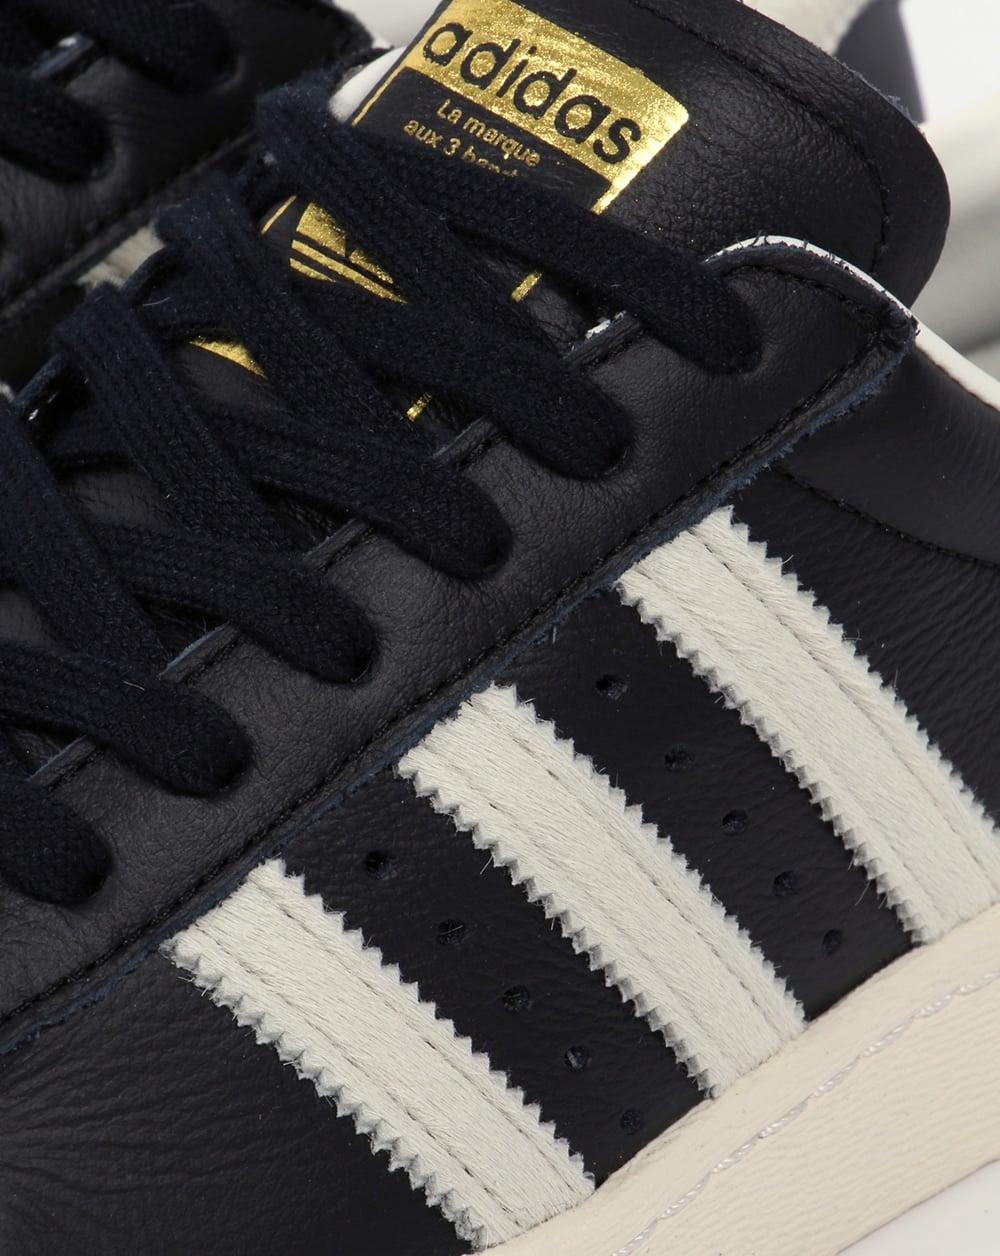 Black White Gold Living Room Decor: Adidas Superstar 80s Trainers Black/White/Gold,originals